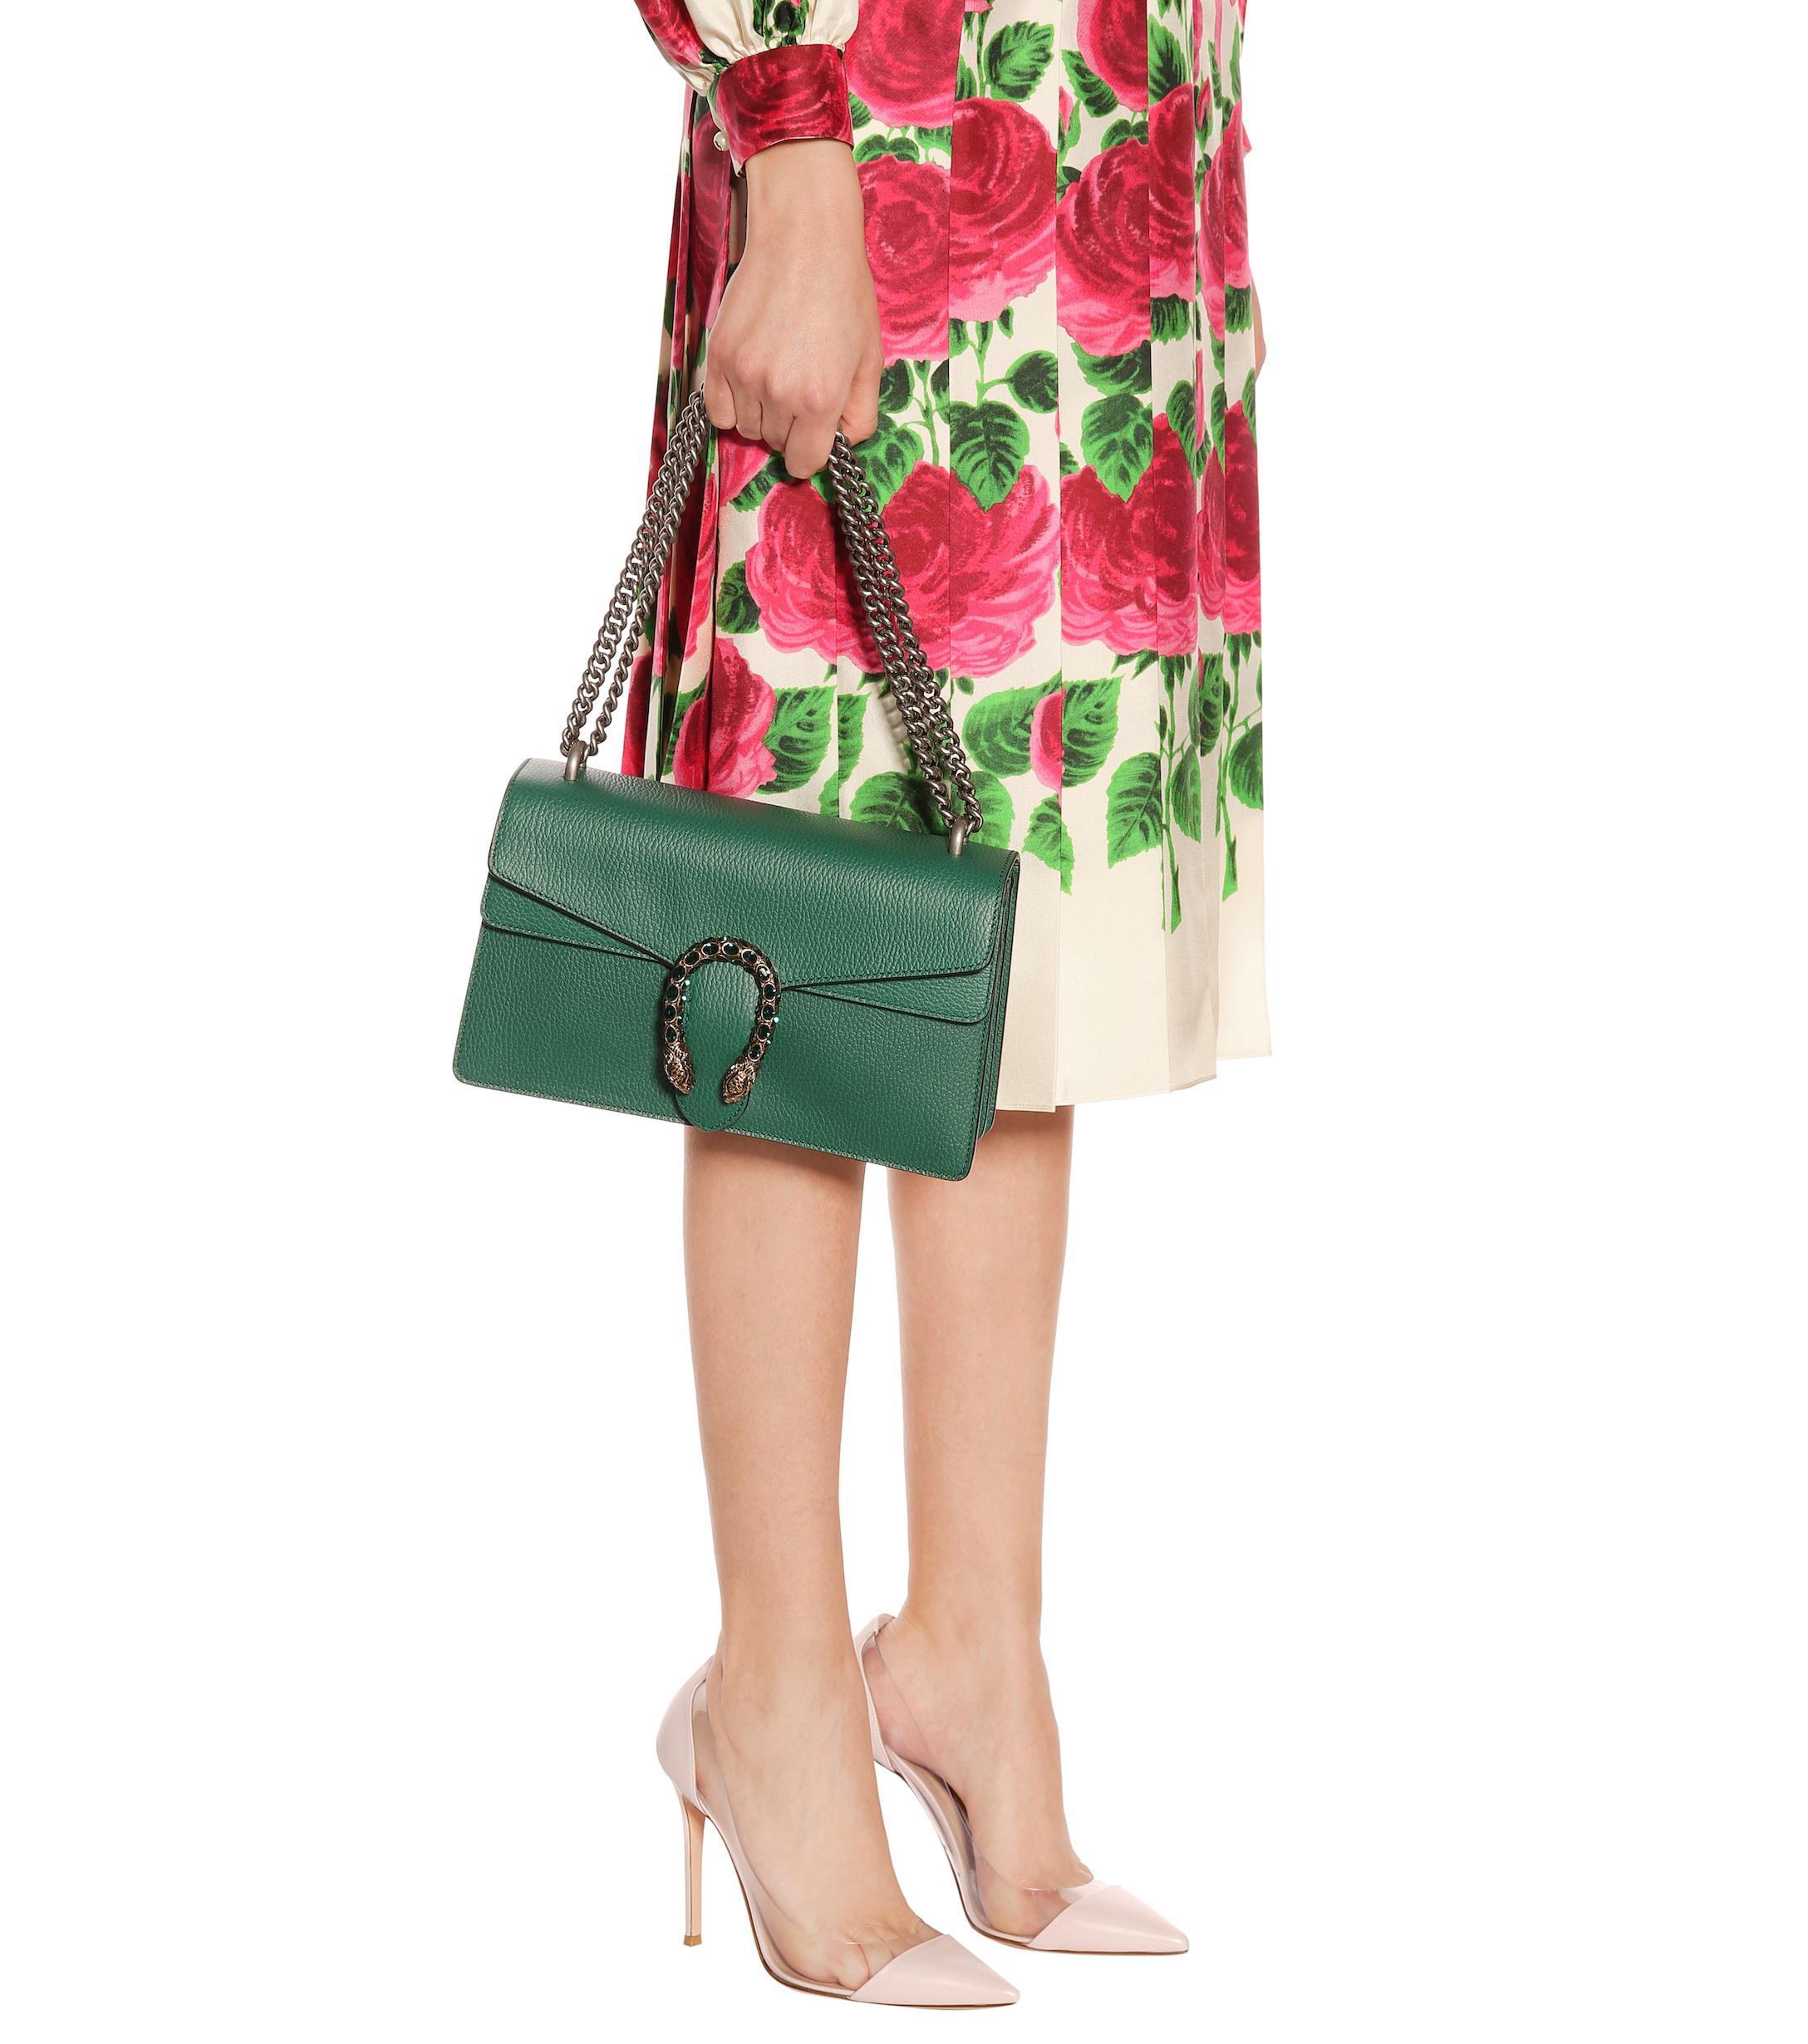 0f99b73e11b3 Gucci - Green Dionysus Small Leather Shoulder Bag - Lyst. View fullscreen